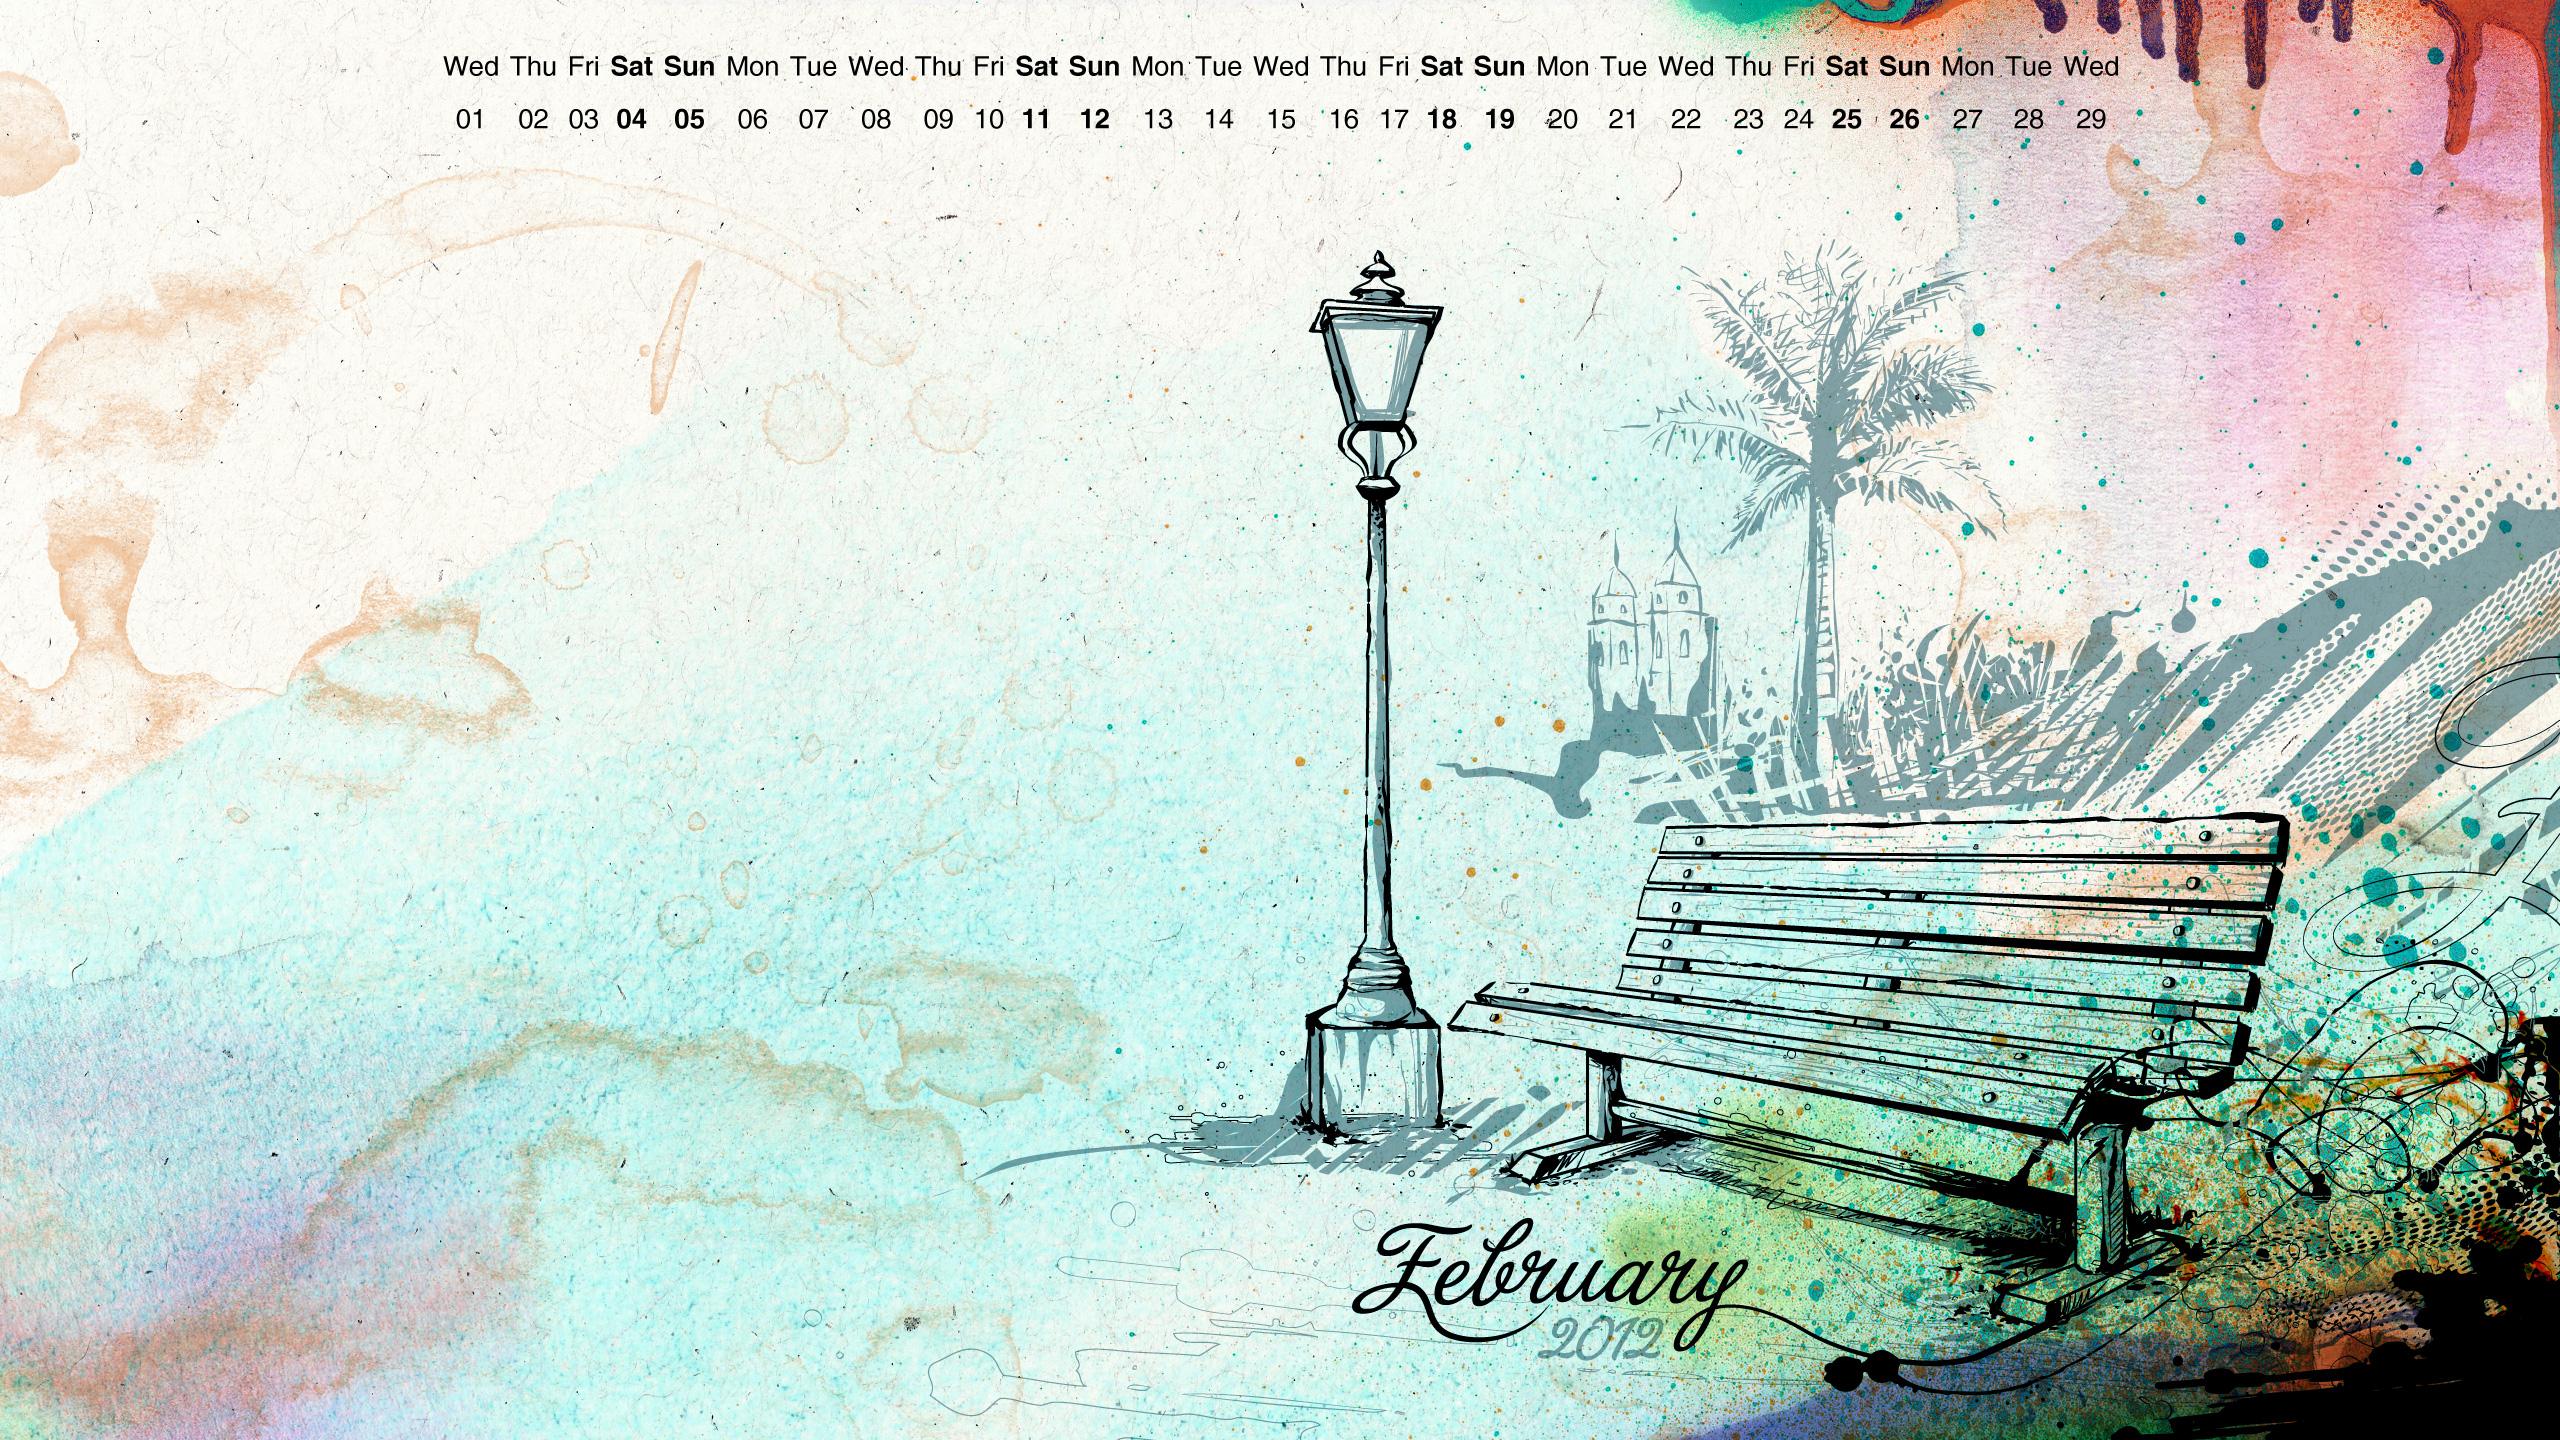 February Wallpaper February wallpaper by reiiz 2560x1440